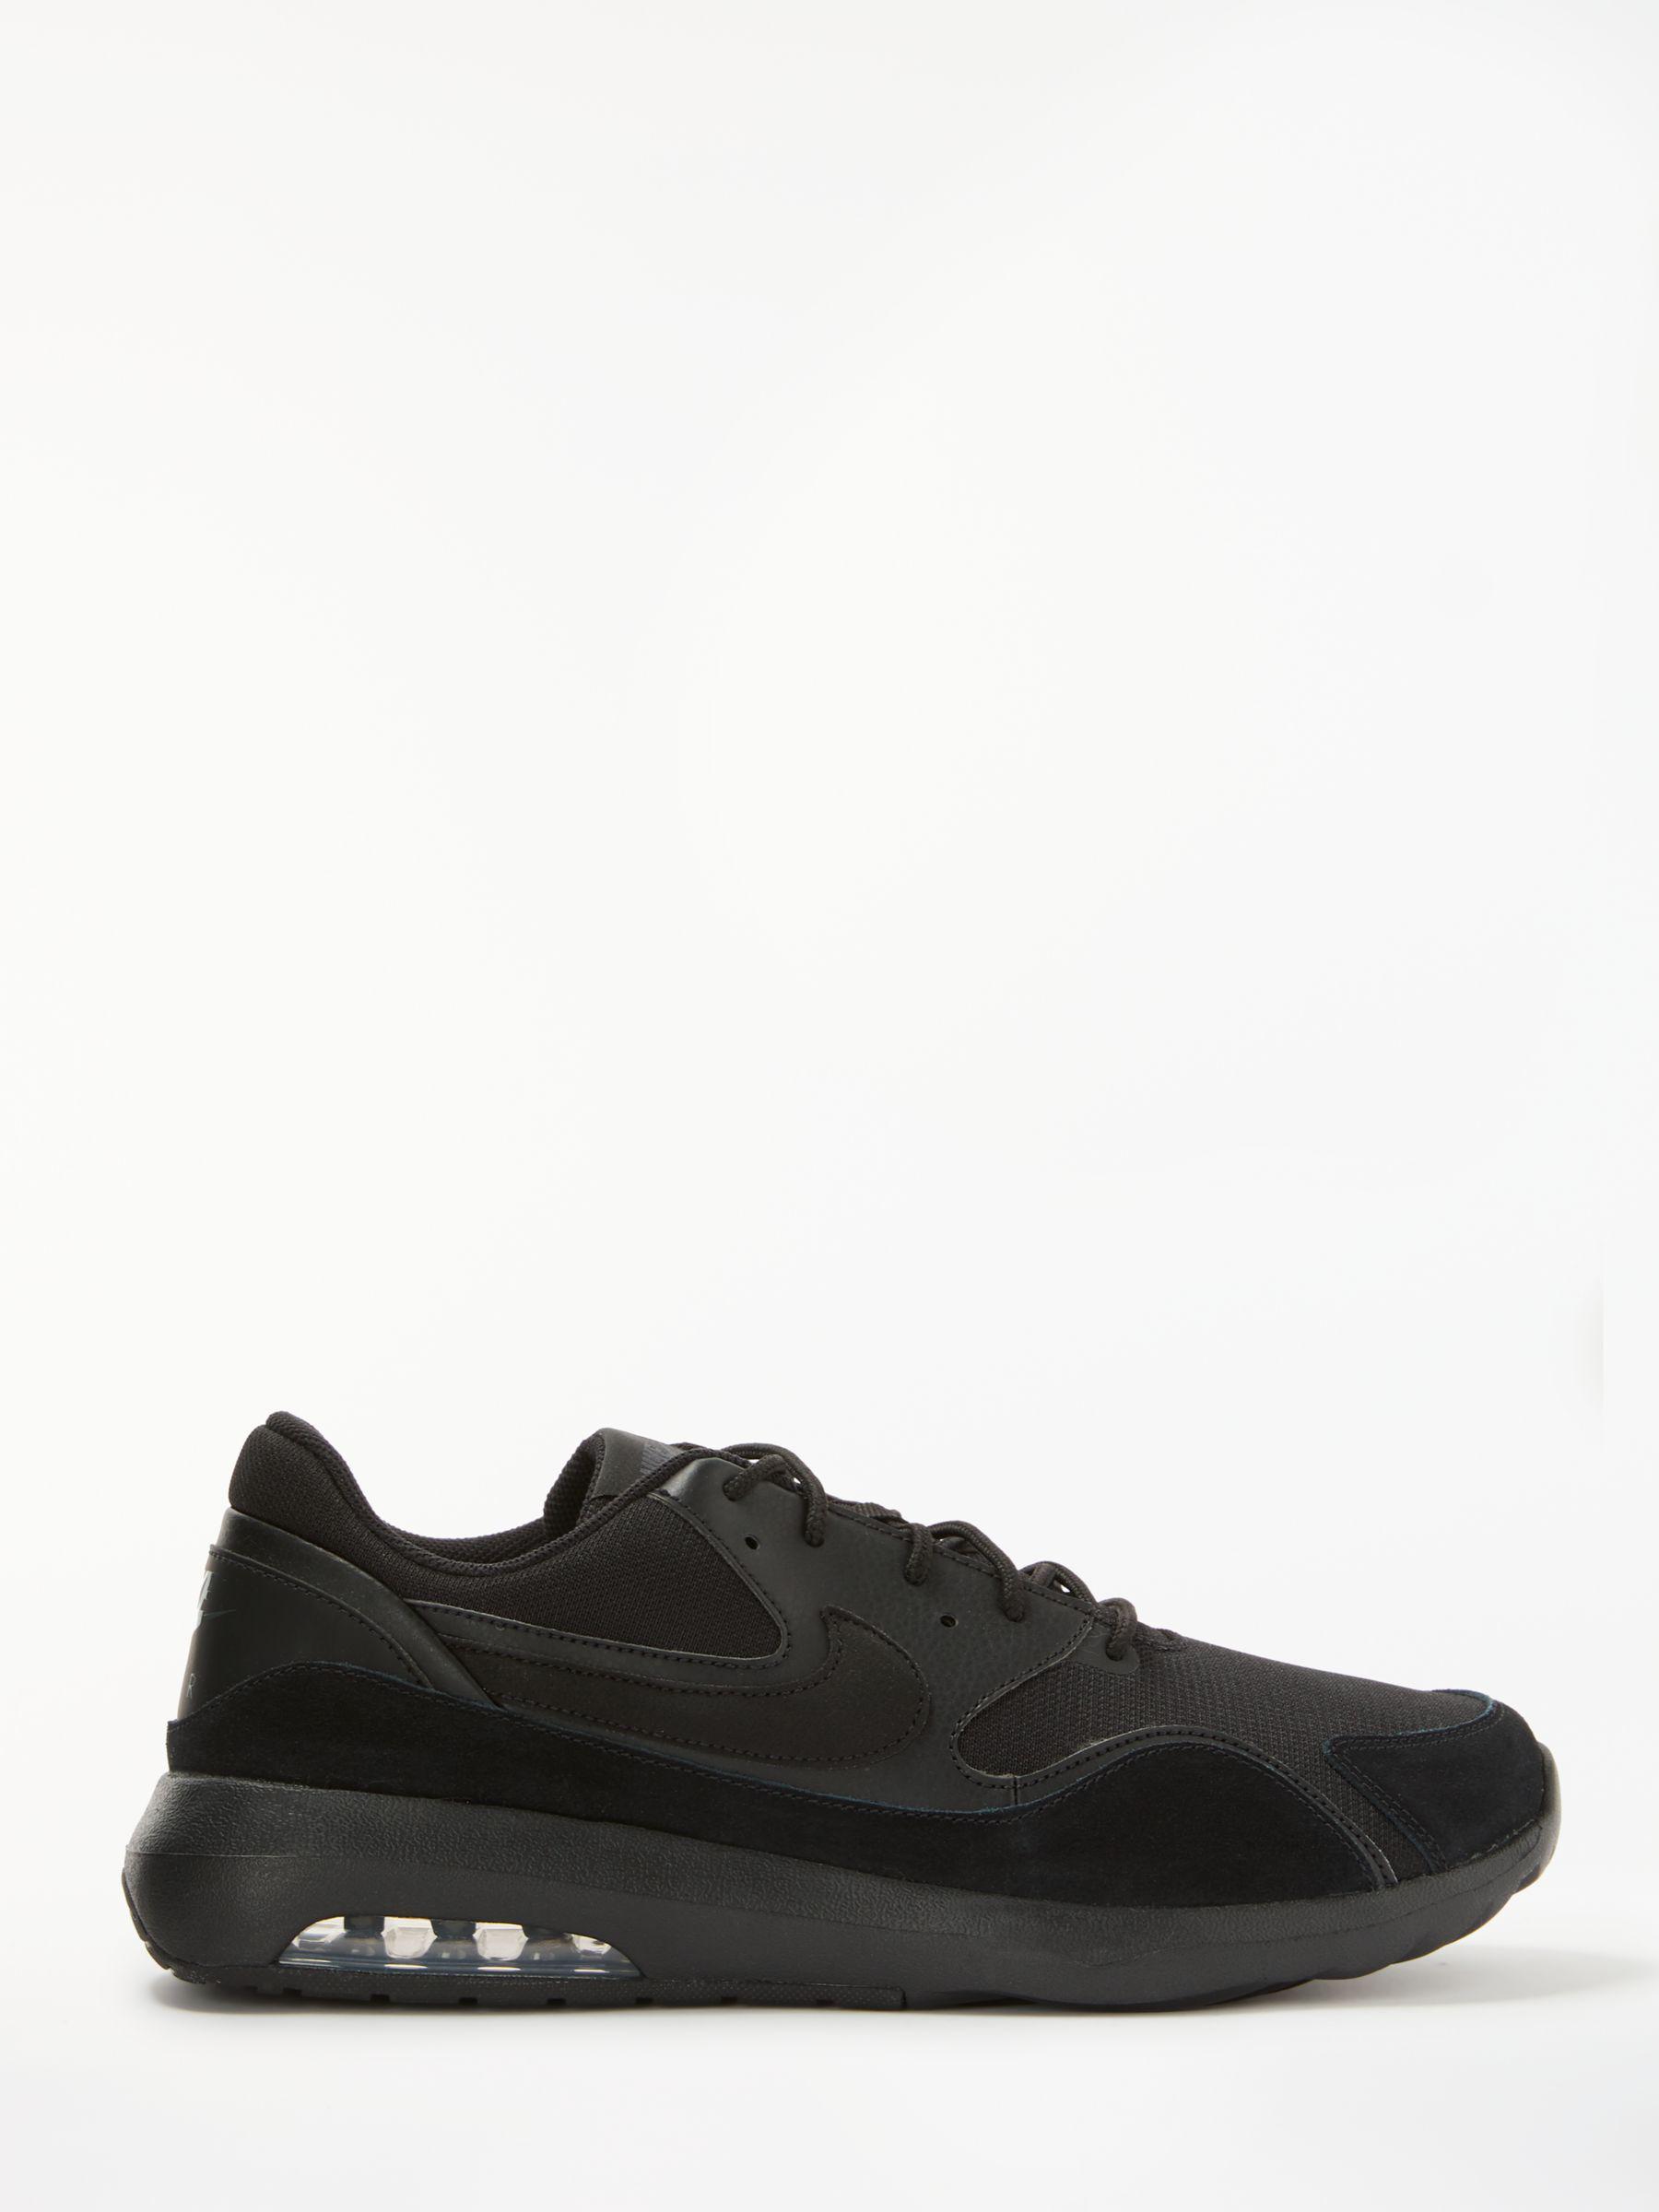 Nike Air Max Nostalgic Men s Trainers in Black for Men - Lyst 048979441